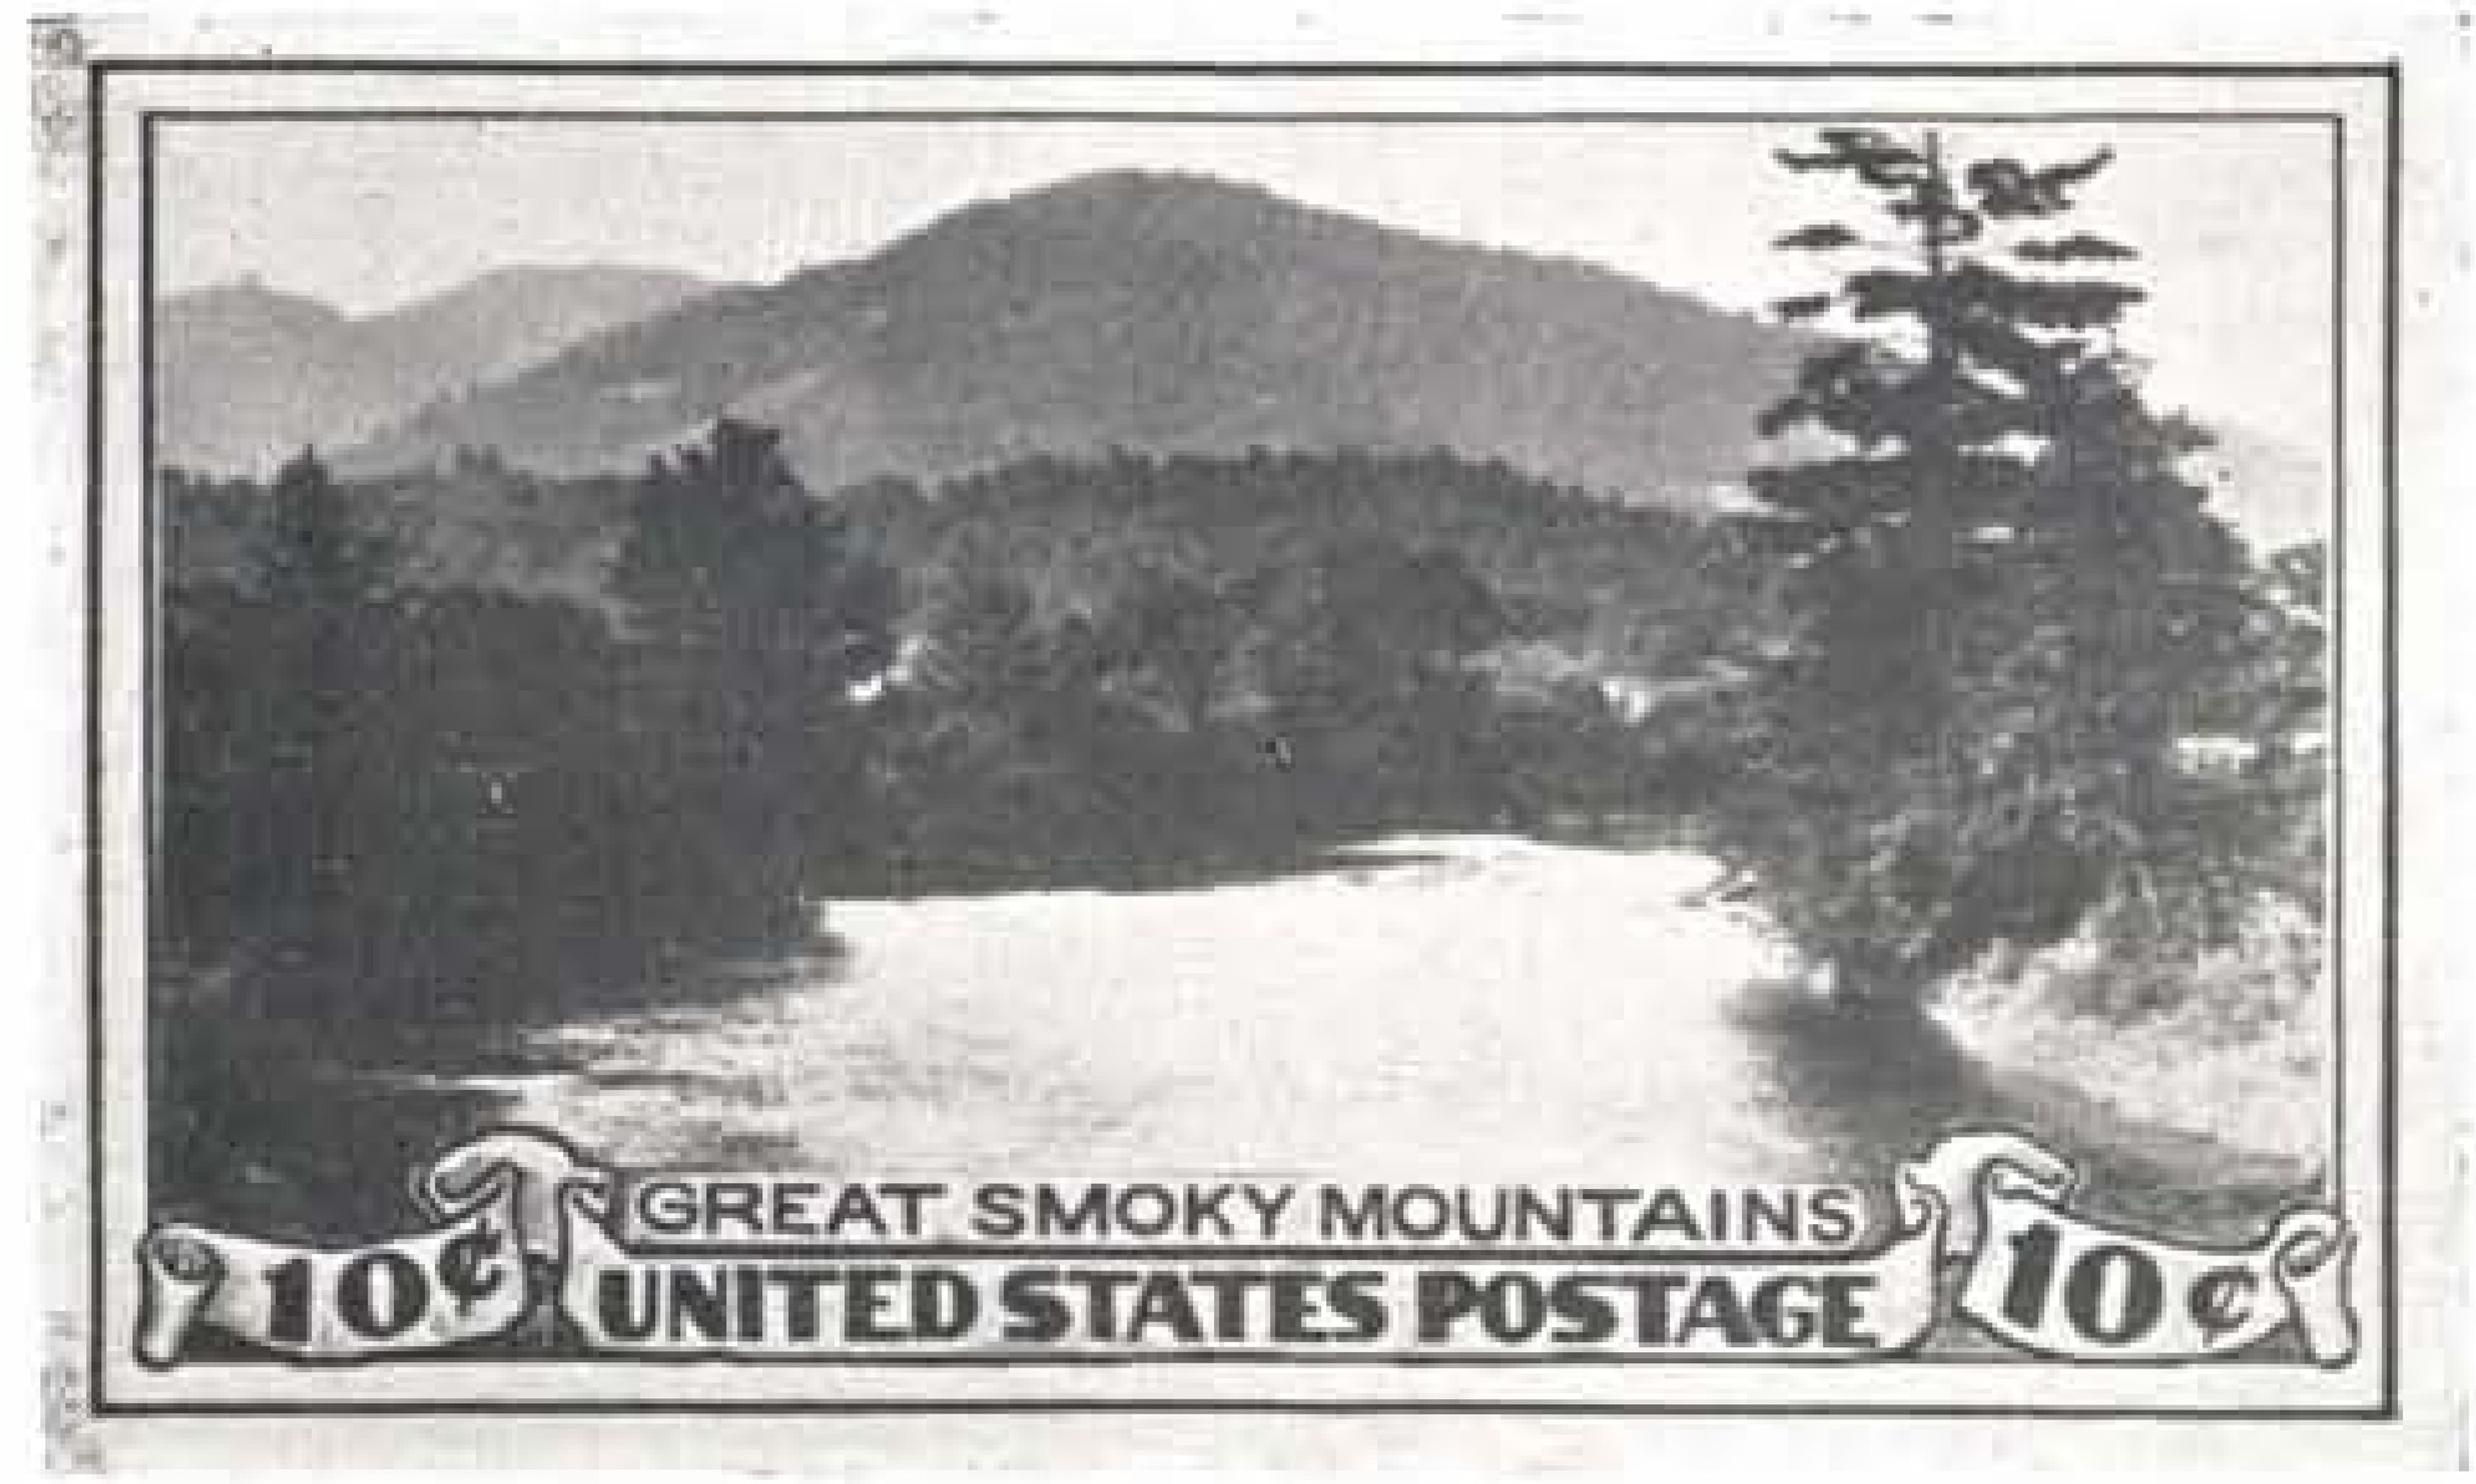 Unused design drawings by Victor S. McCloskey, Jr. in horizontal format